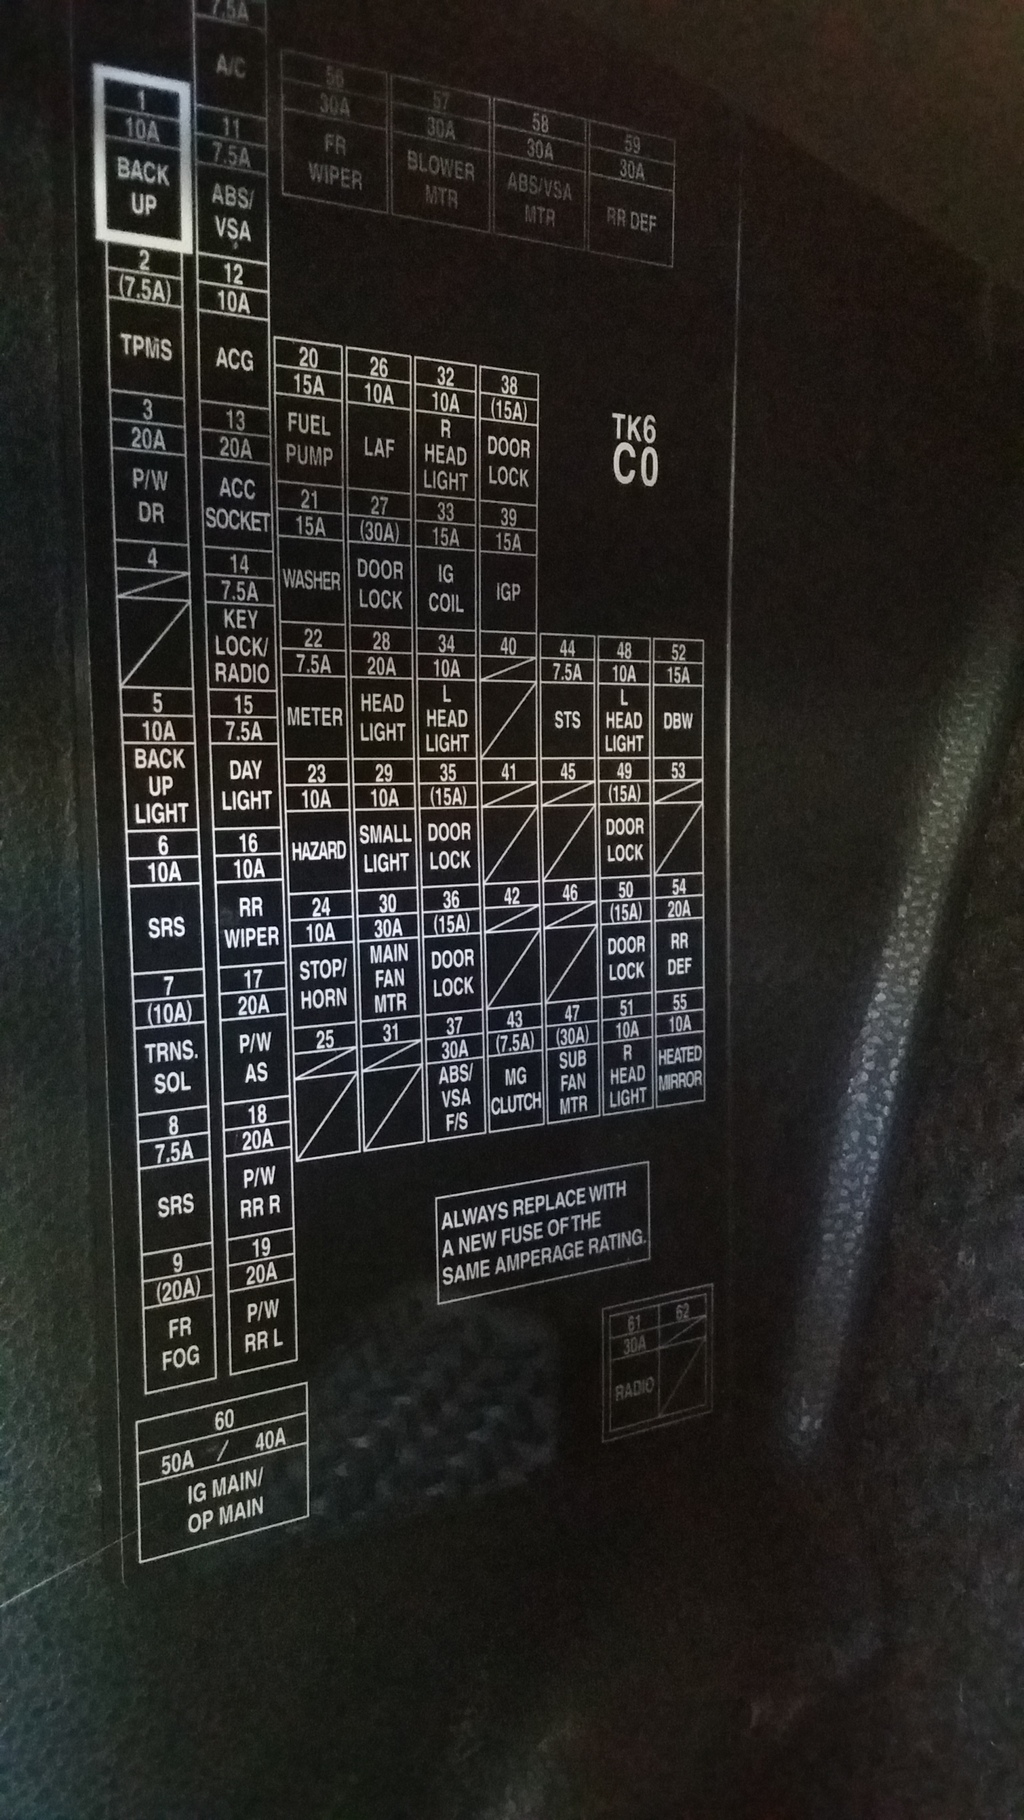 Mitsubishi Canter Fuse Box Diagram Wiring Landor 2001 Fuso Marvelous Location Contemporary Best